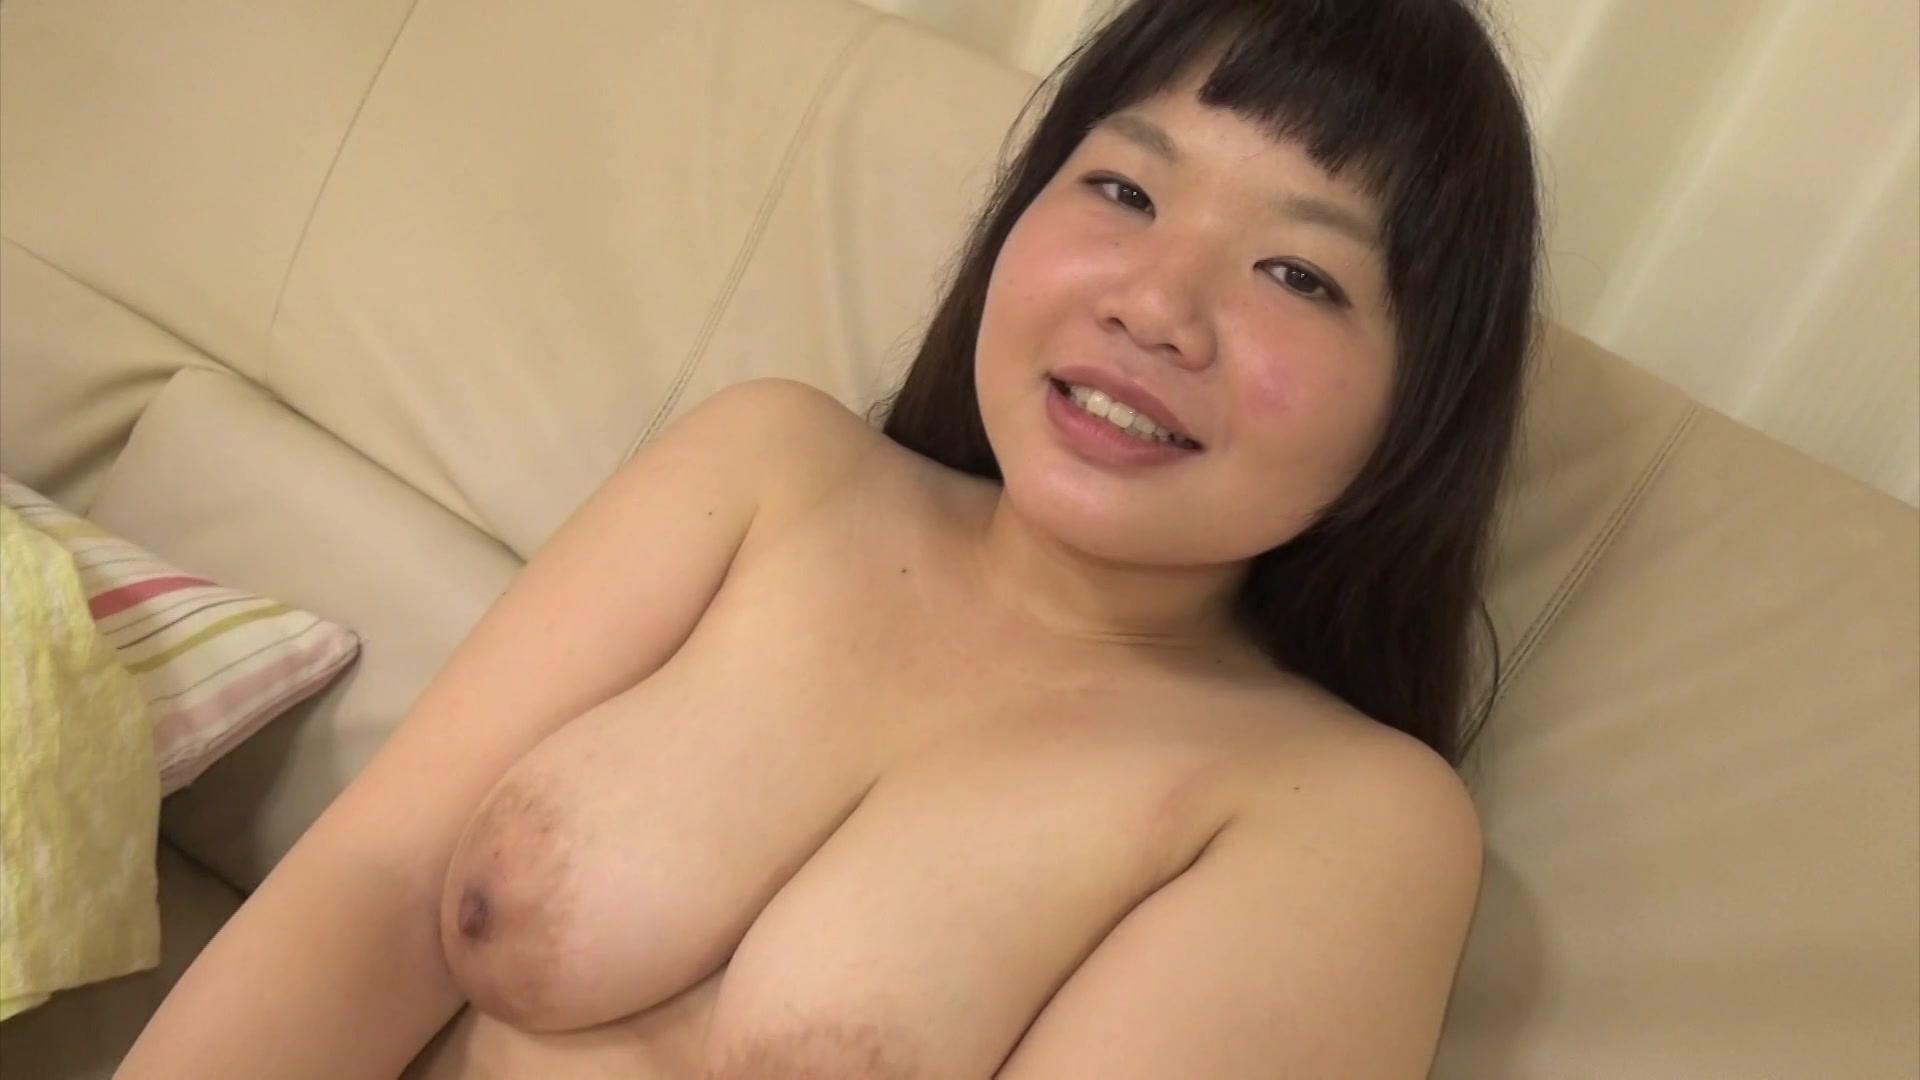 Nude Pix Otngagged closeup wet asian